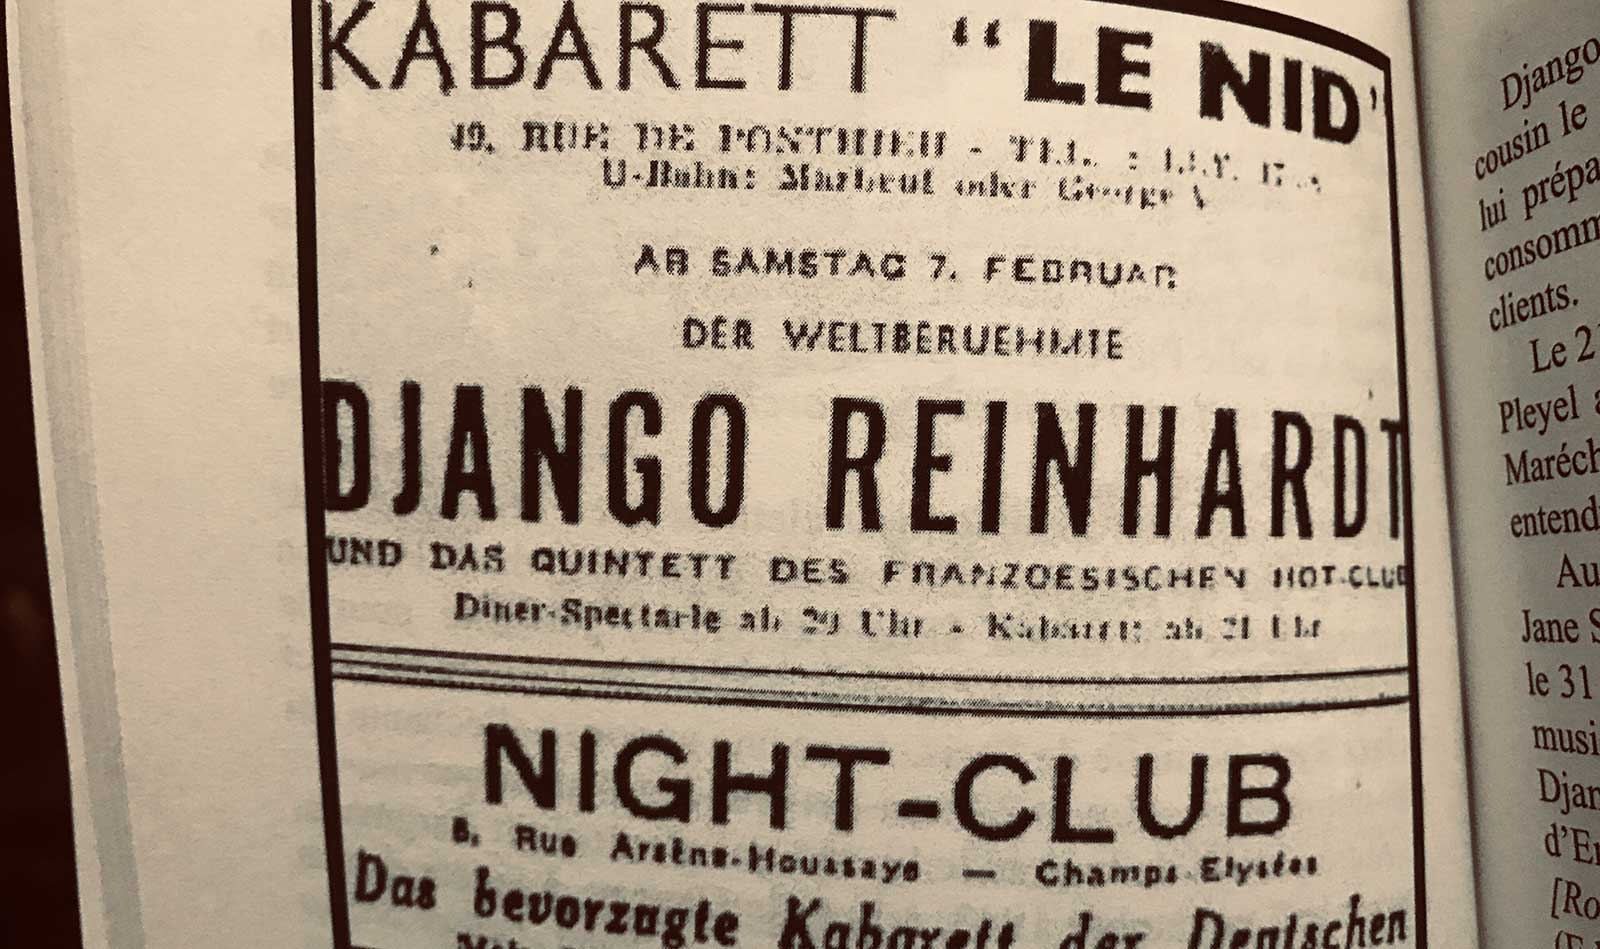 DJANGO REINHARDT Un musicien tsigane dans l'Europe nazie – Gérard Régnier